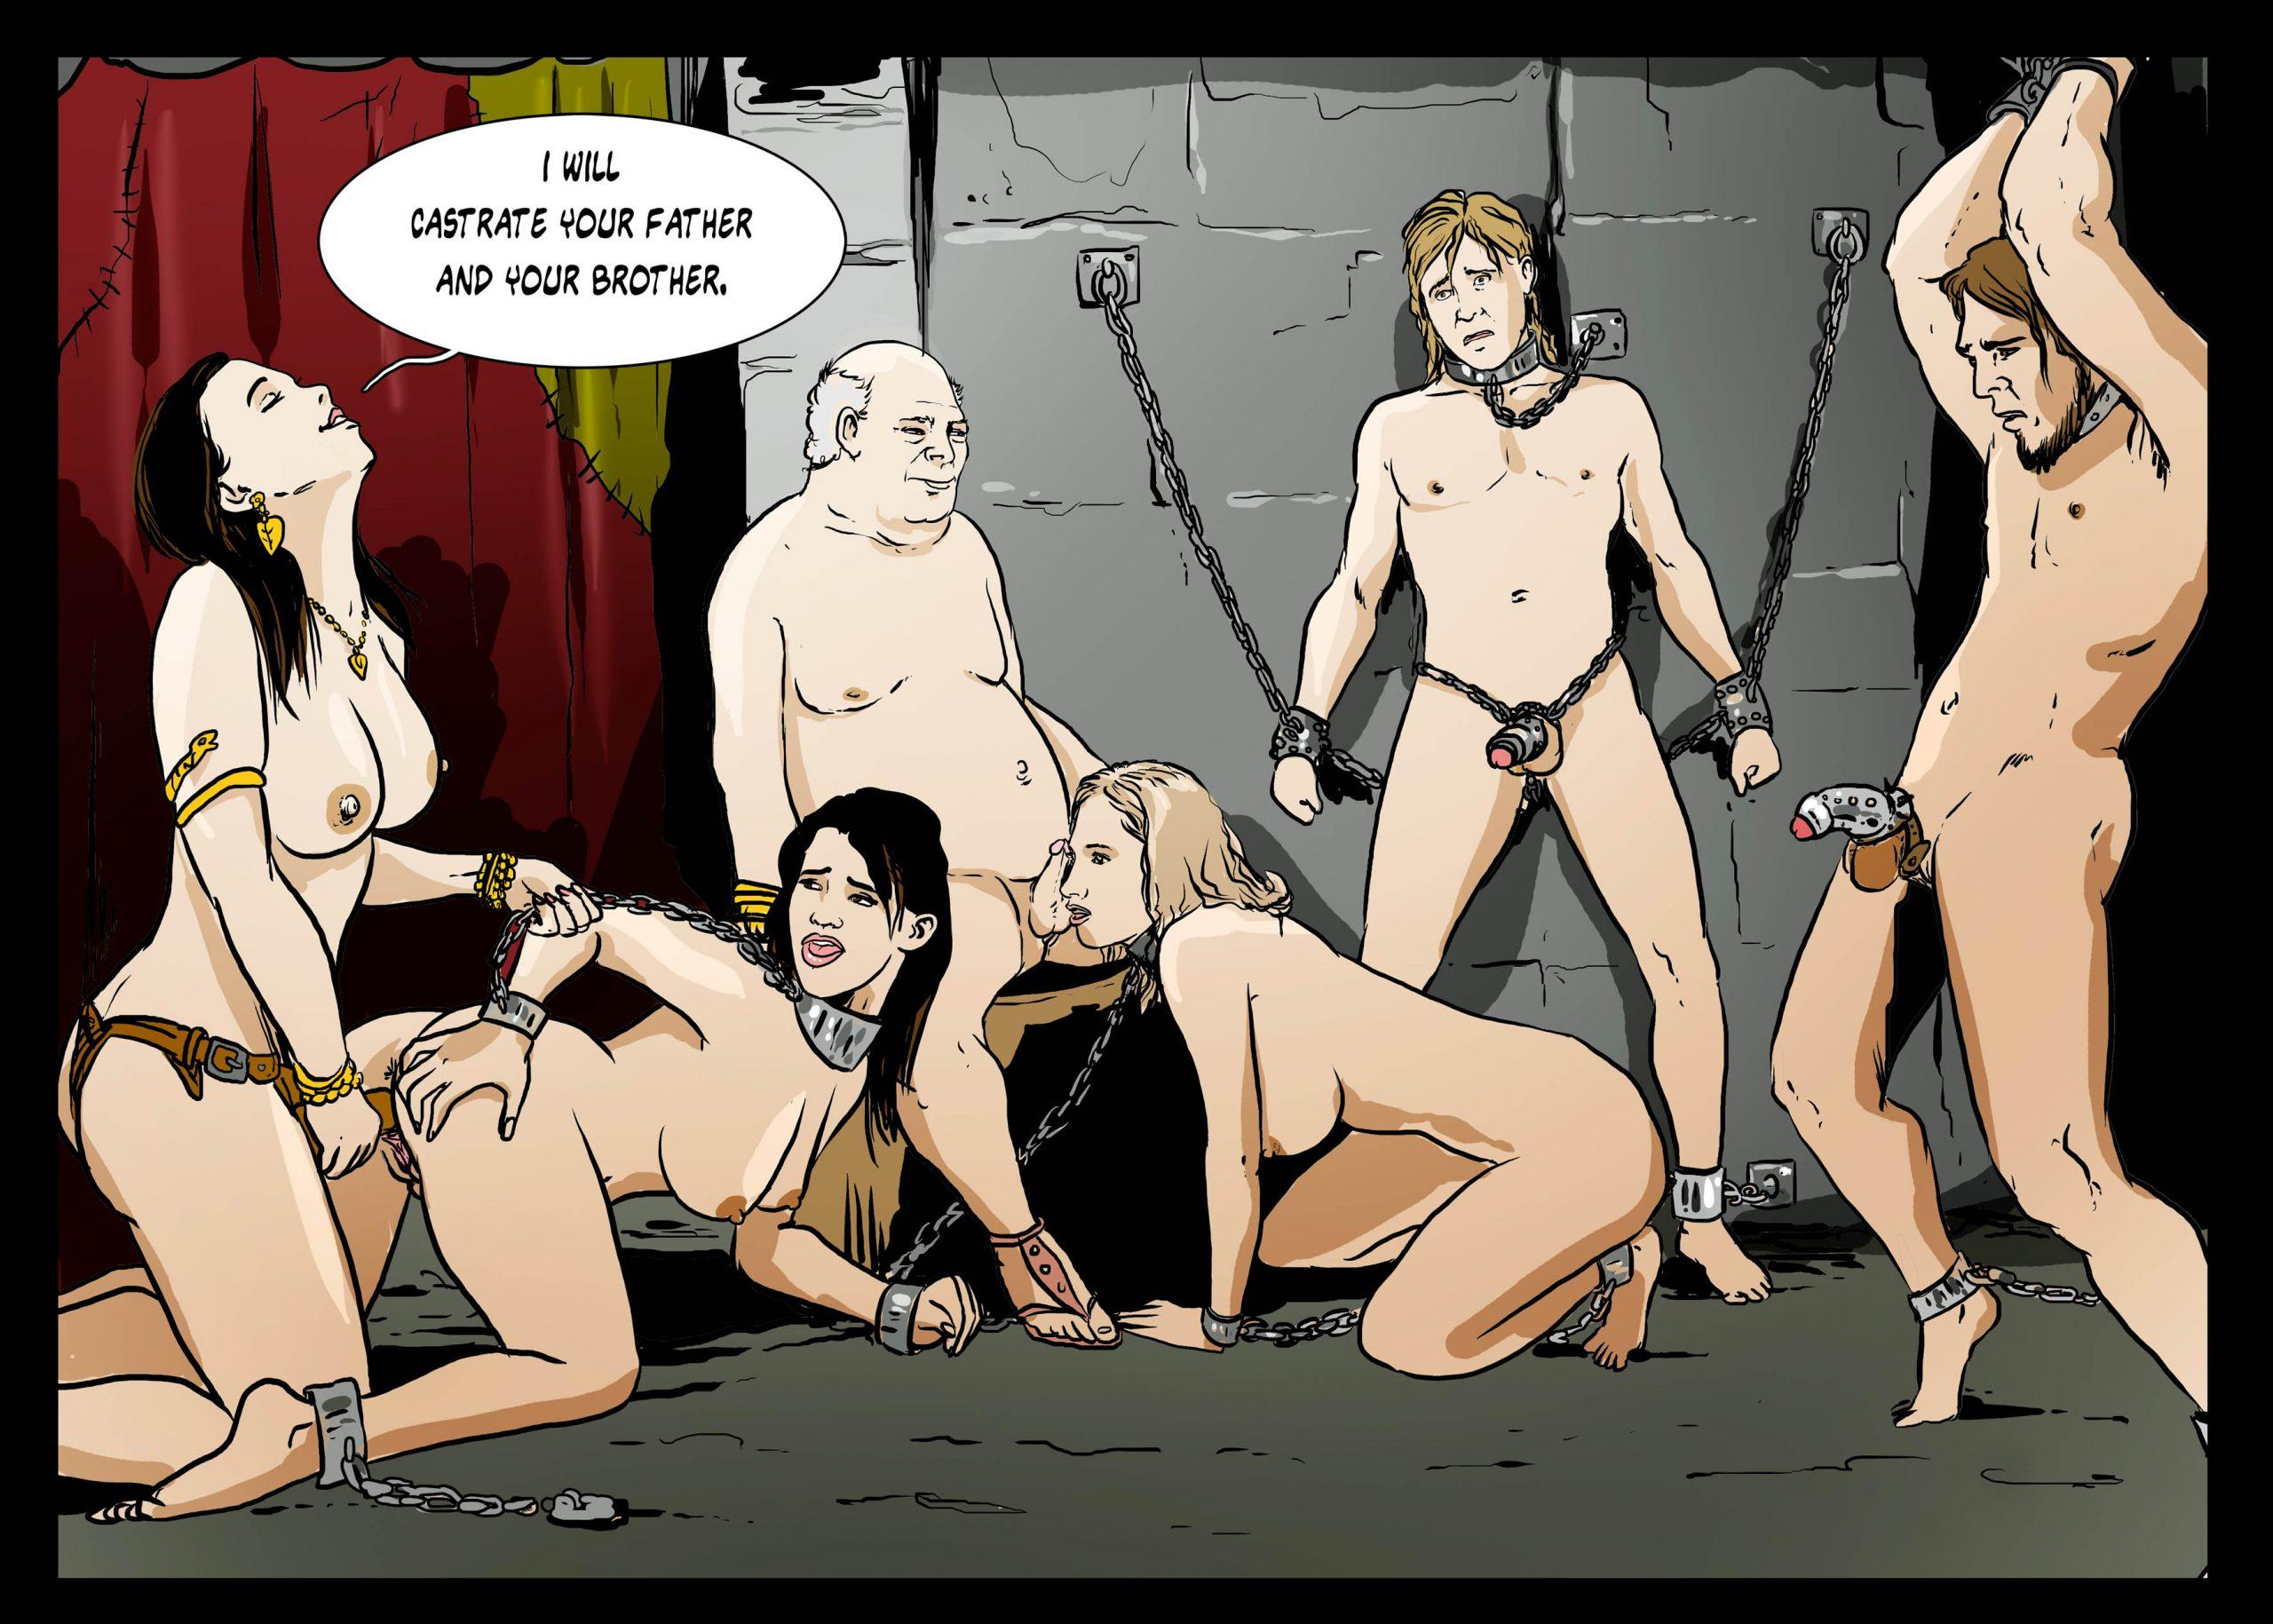 Dildo Cartoon Porn Pictures